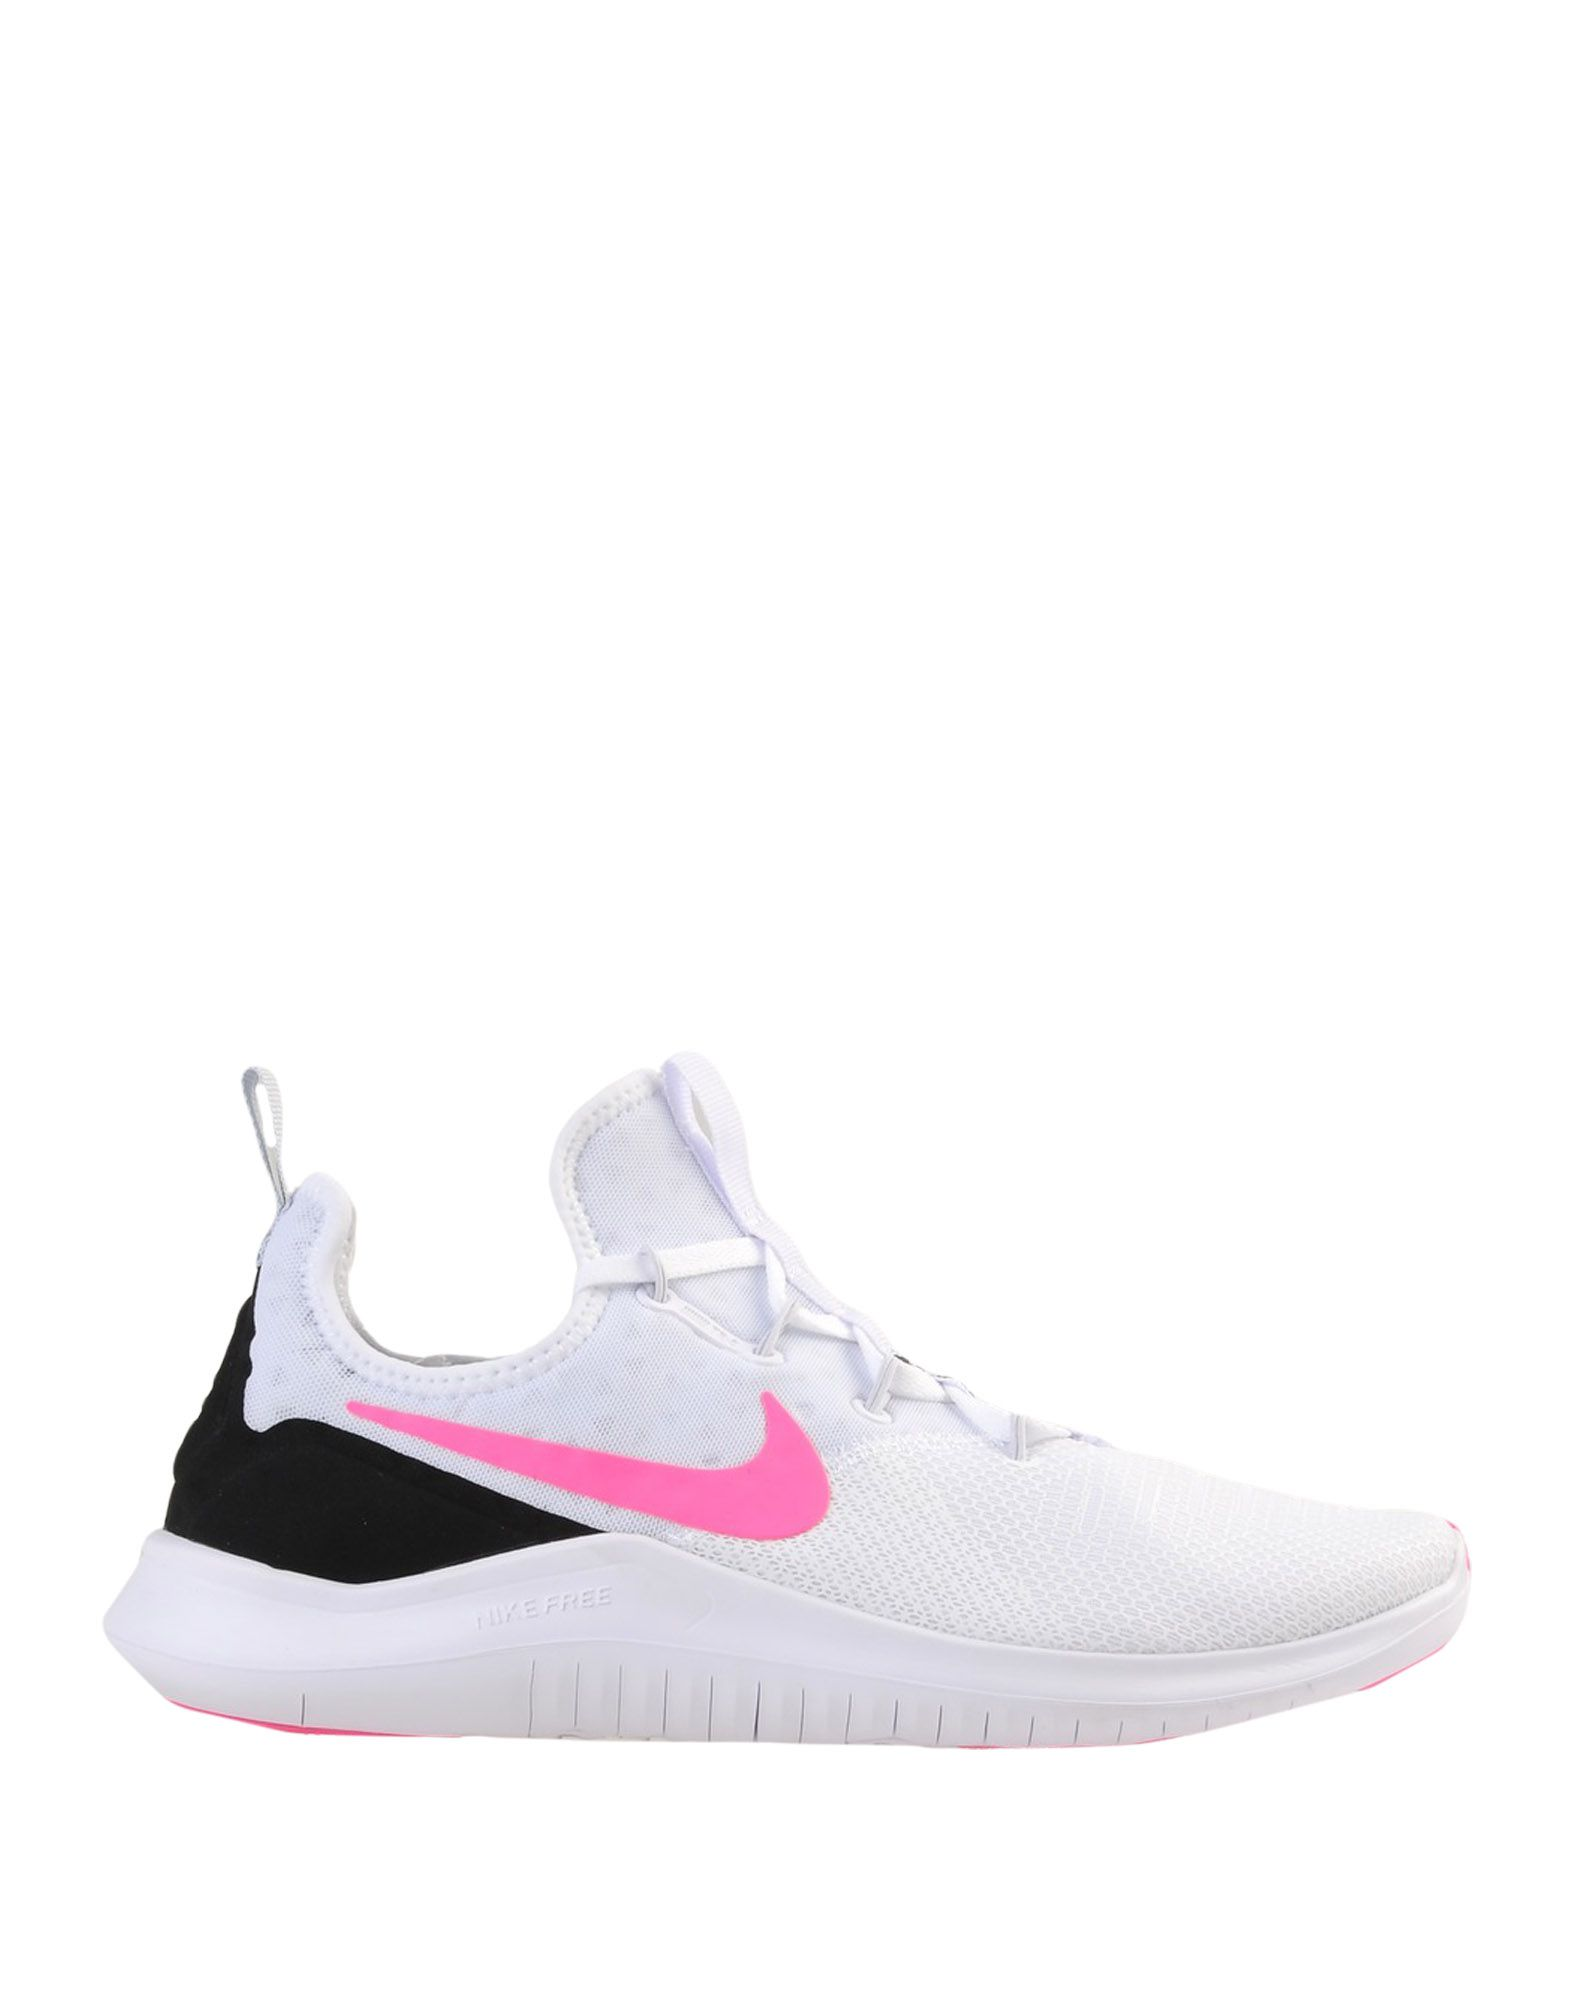 Scarpe da Ginnastica Nike 8   Free Tr 8 Nike - Donna - 11565809QW 2c3aad